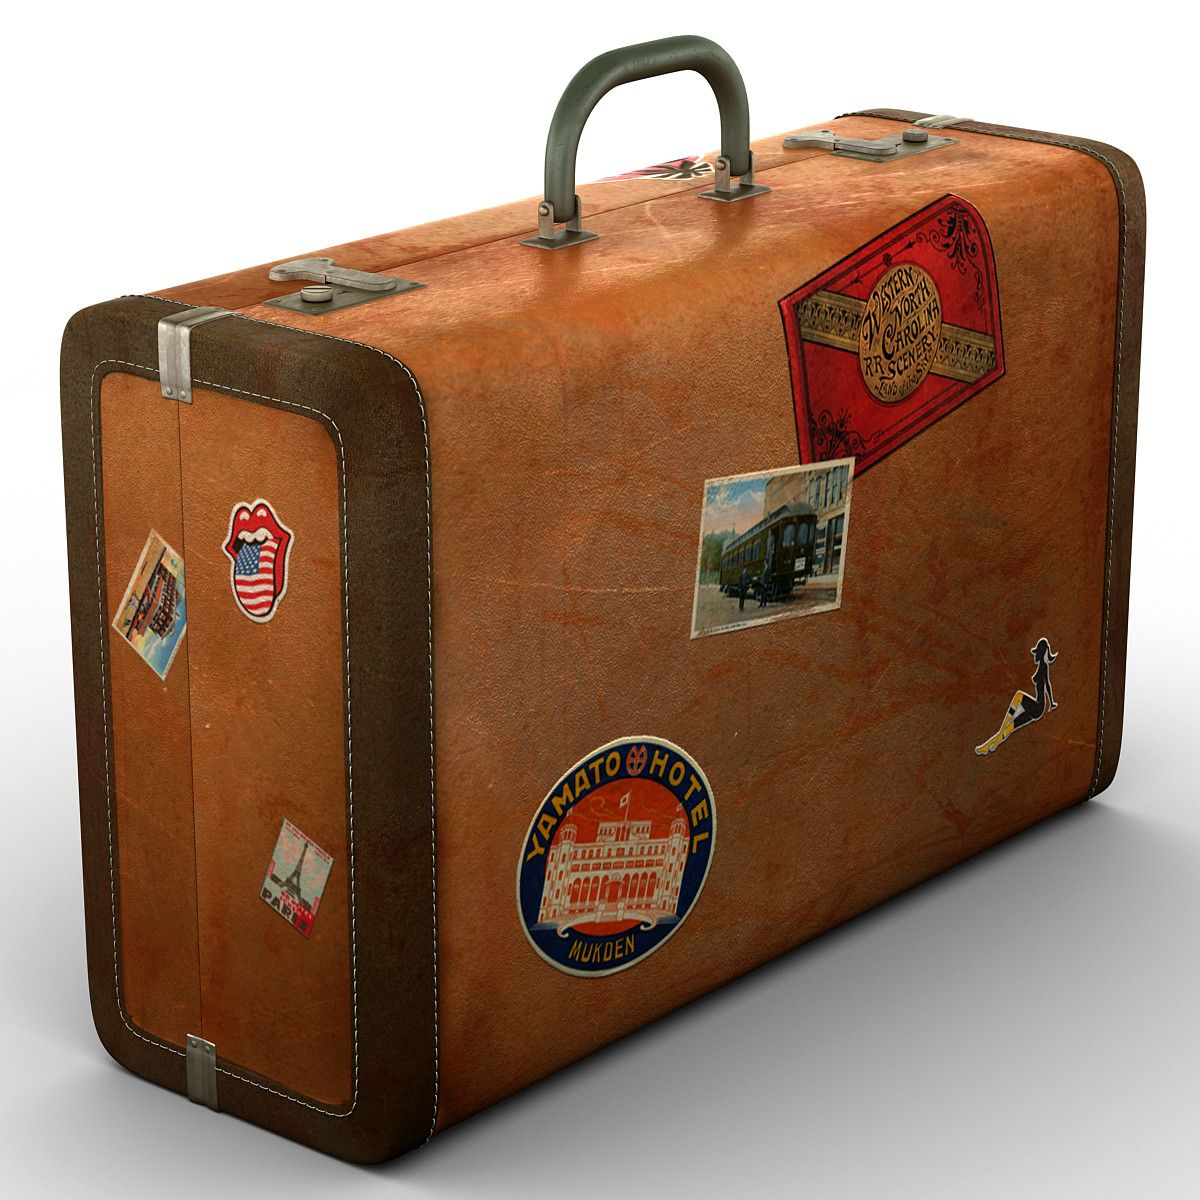 3d model of old suitcase | images | Pinterest | 3d